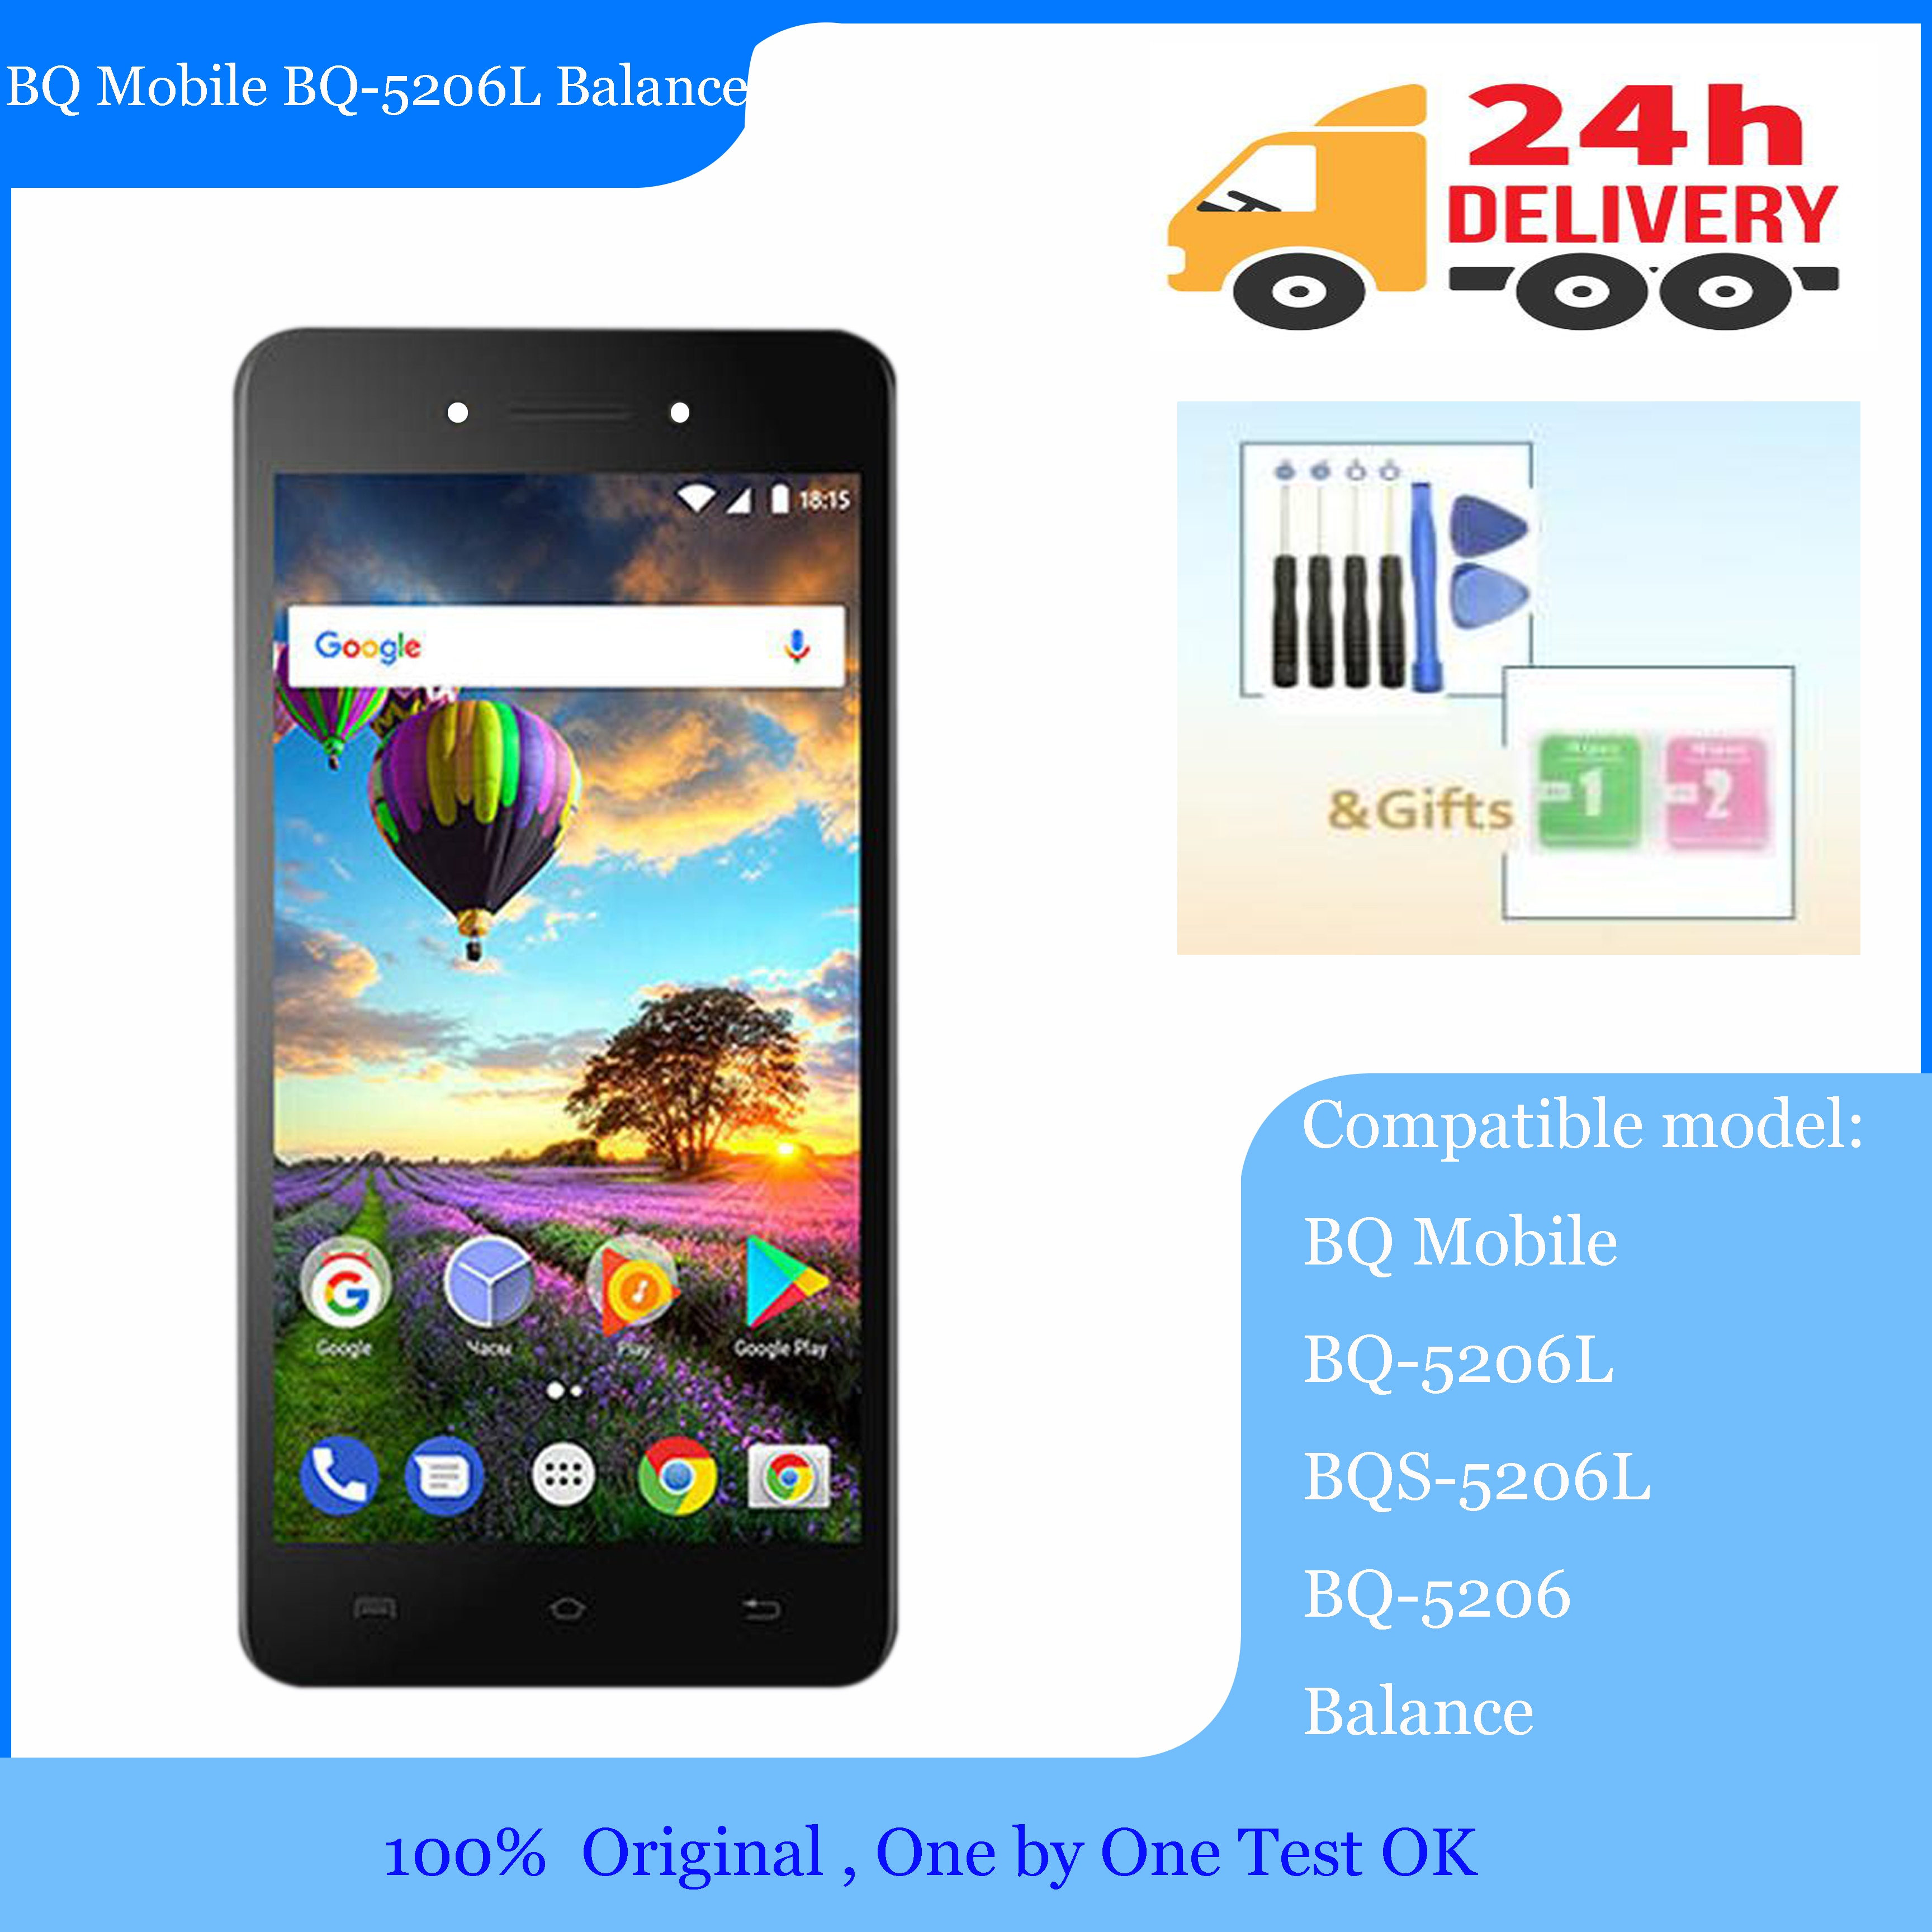 NEW Lcd 5.2inch for BQ Mobile BQ-5206L Balance BQ-5206L BQS-5206 BQ 5206L  LCD Display With Touch screen Digitizier Assembly